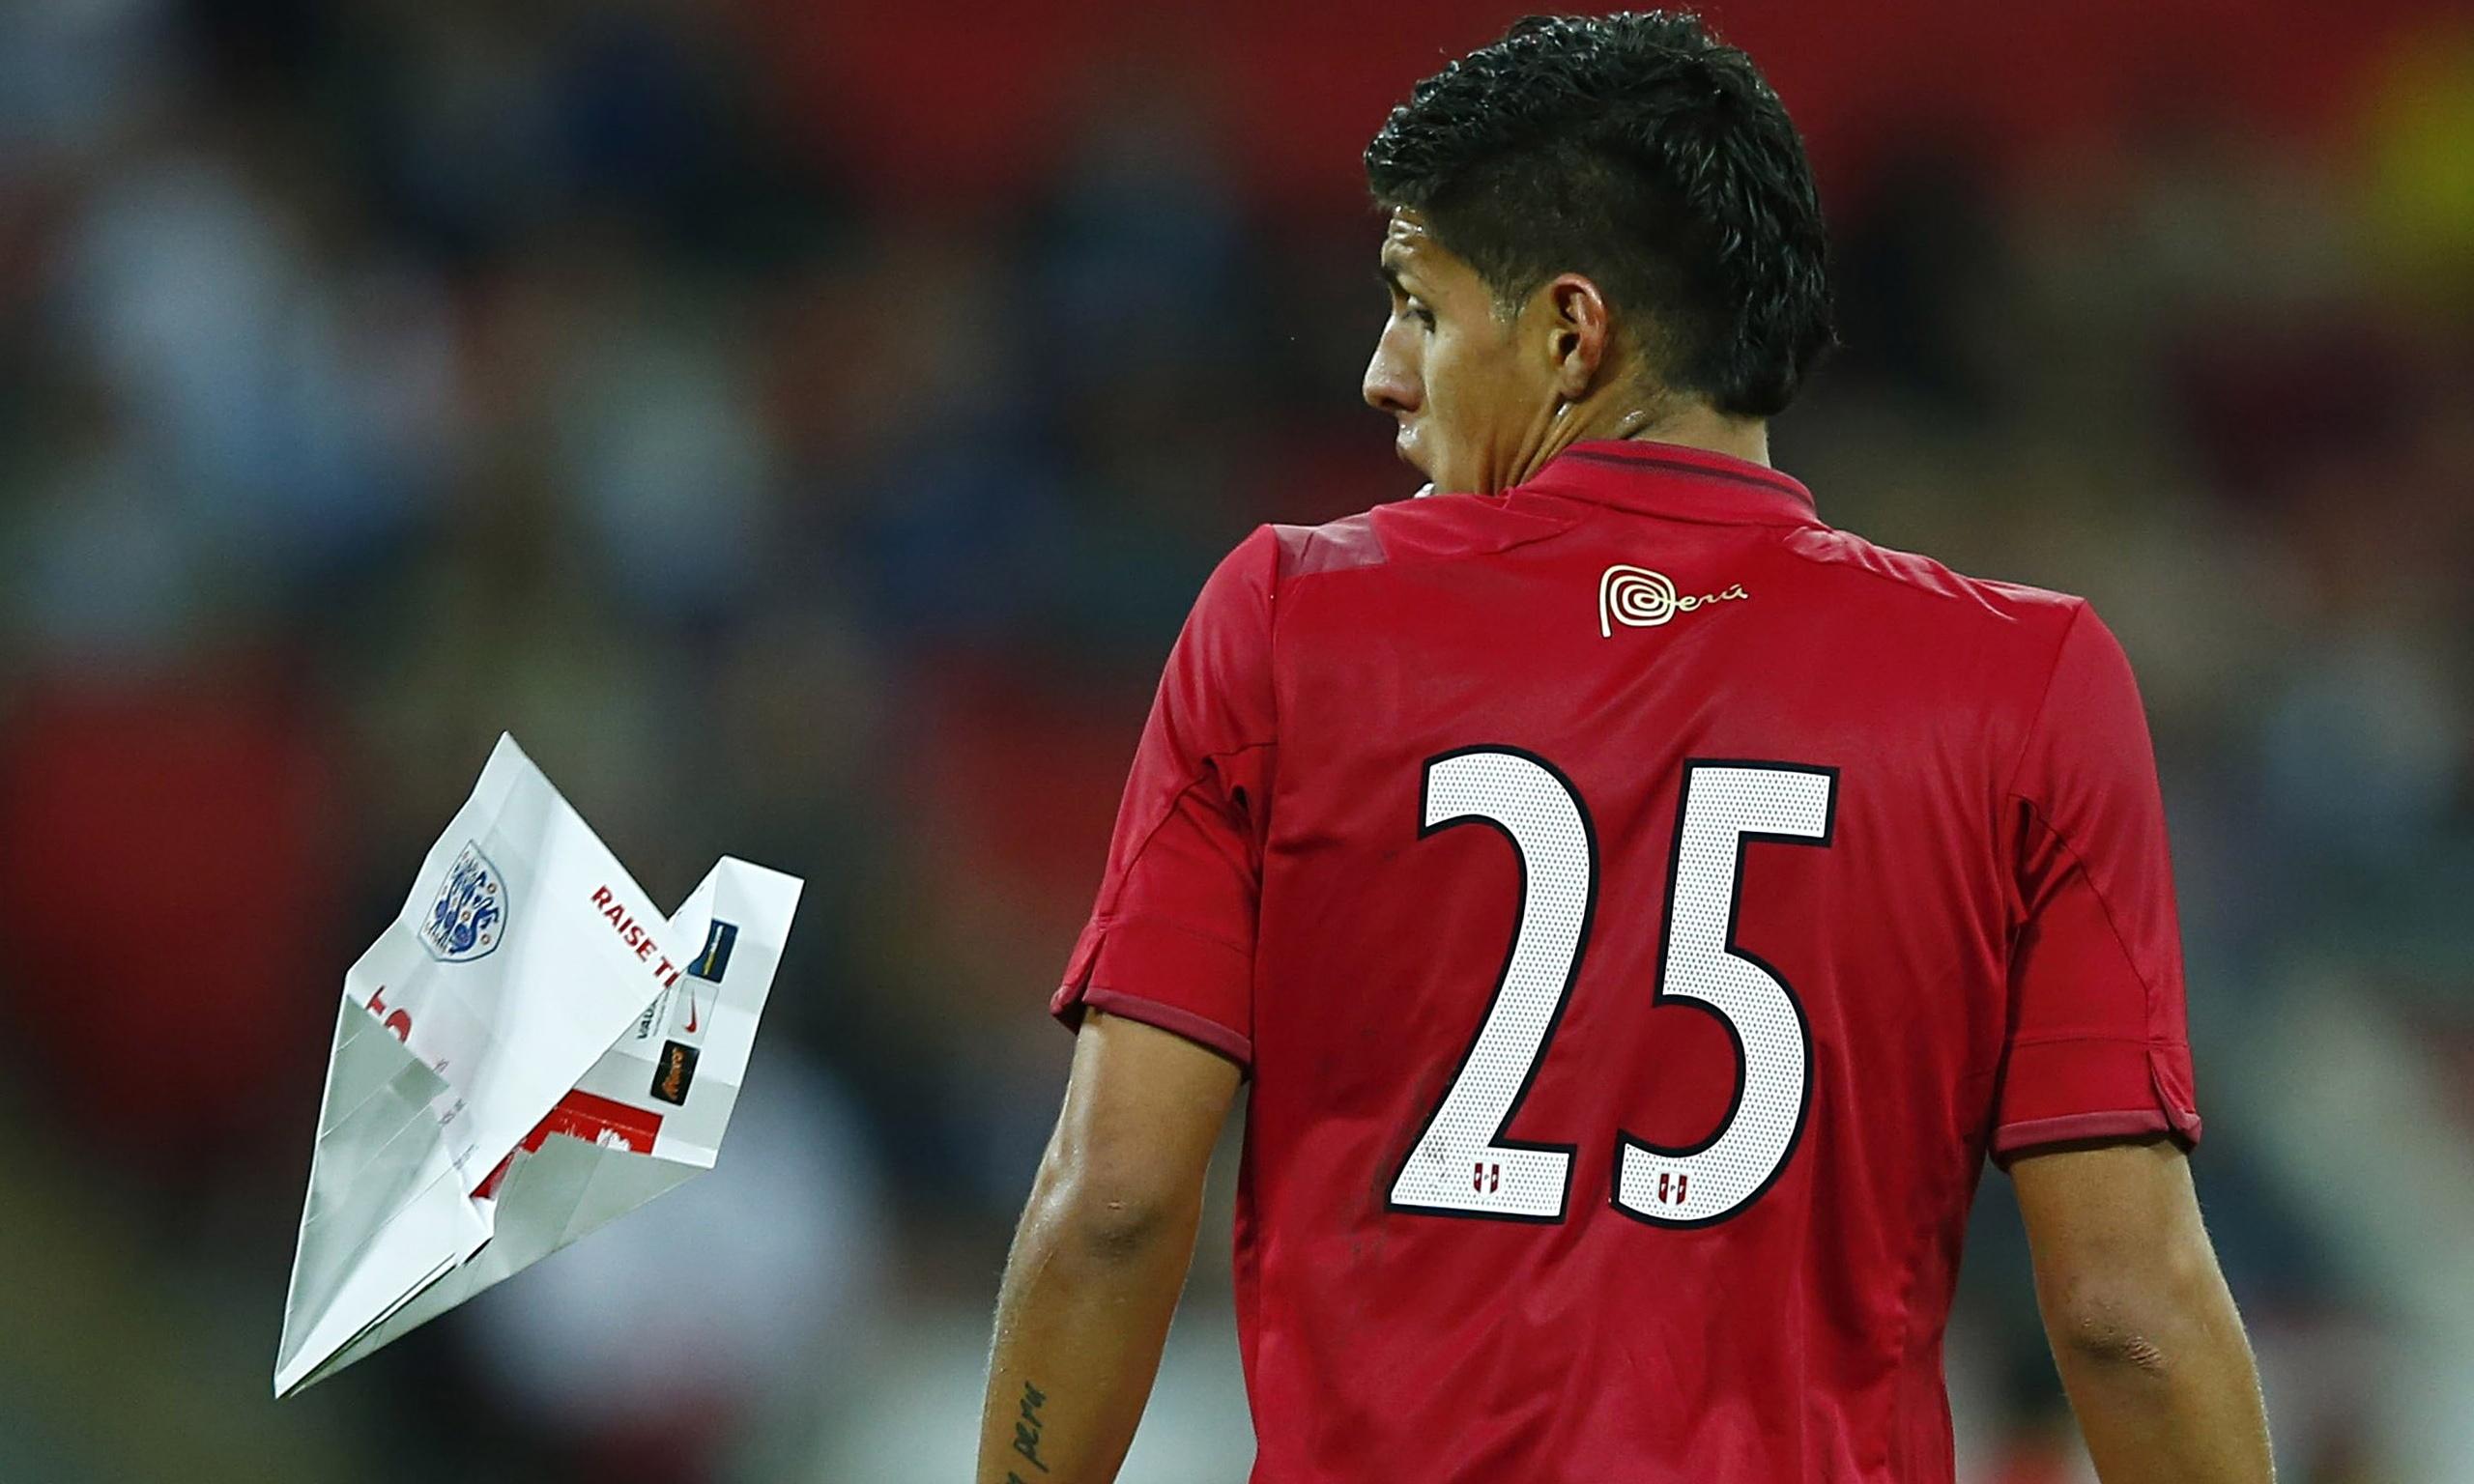 Hansell Riojas Paper plane hits Peru player during England friendly at